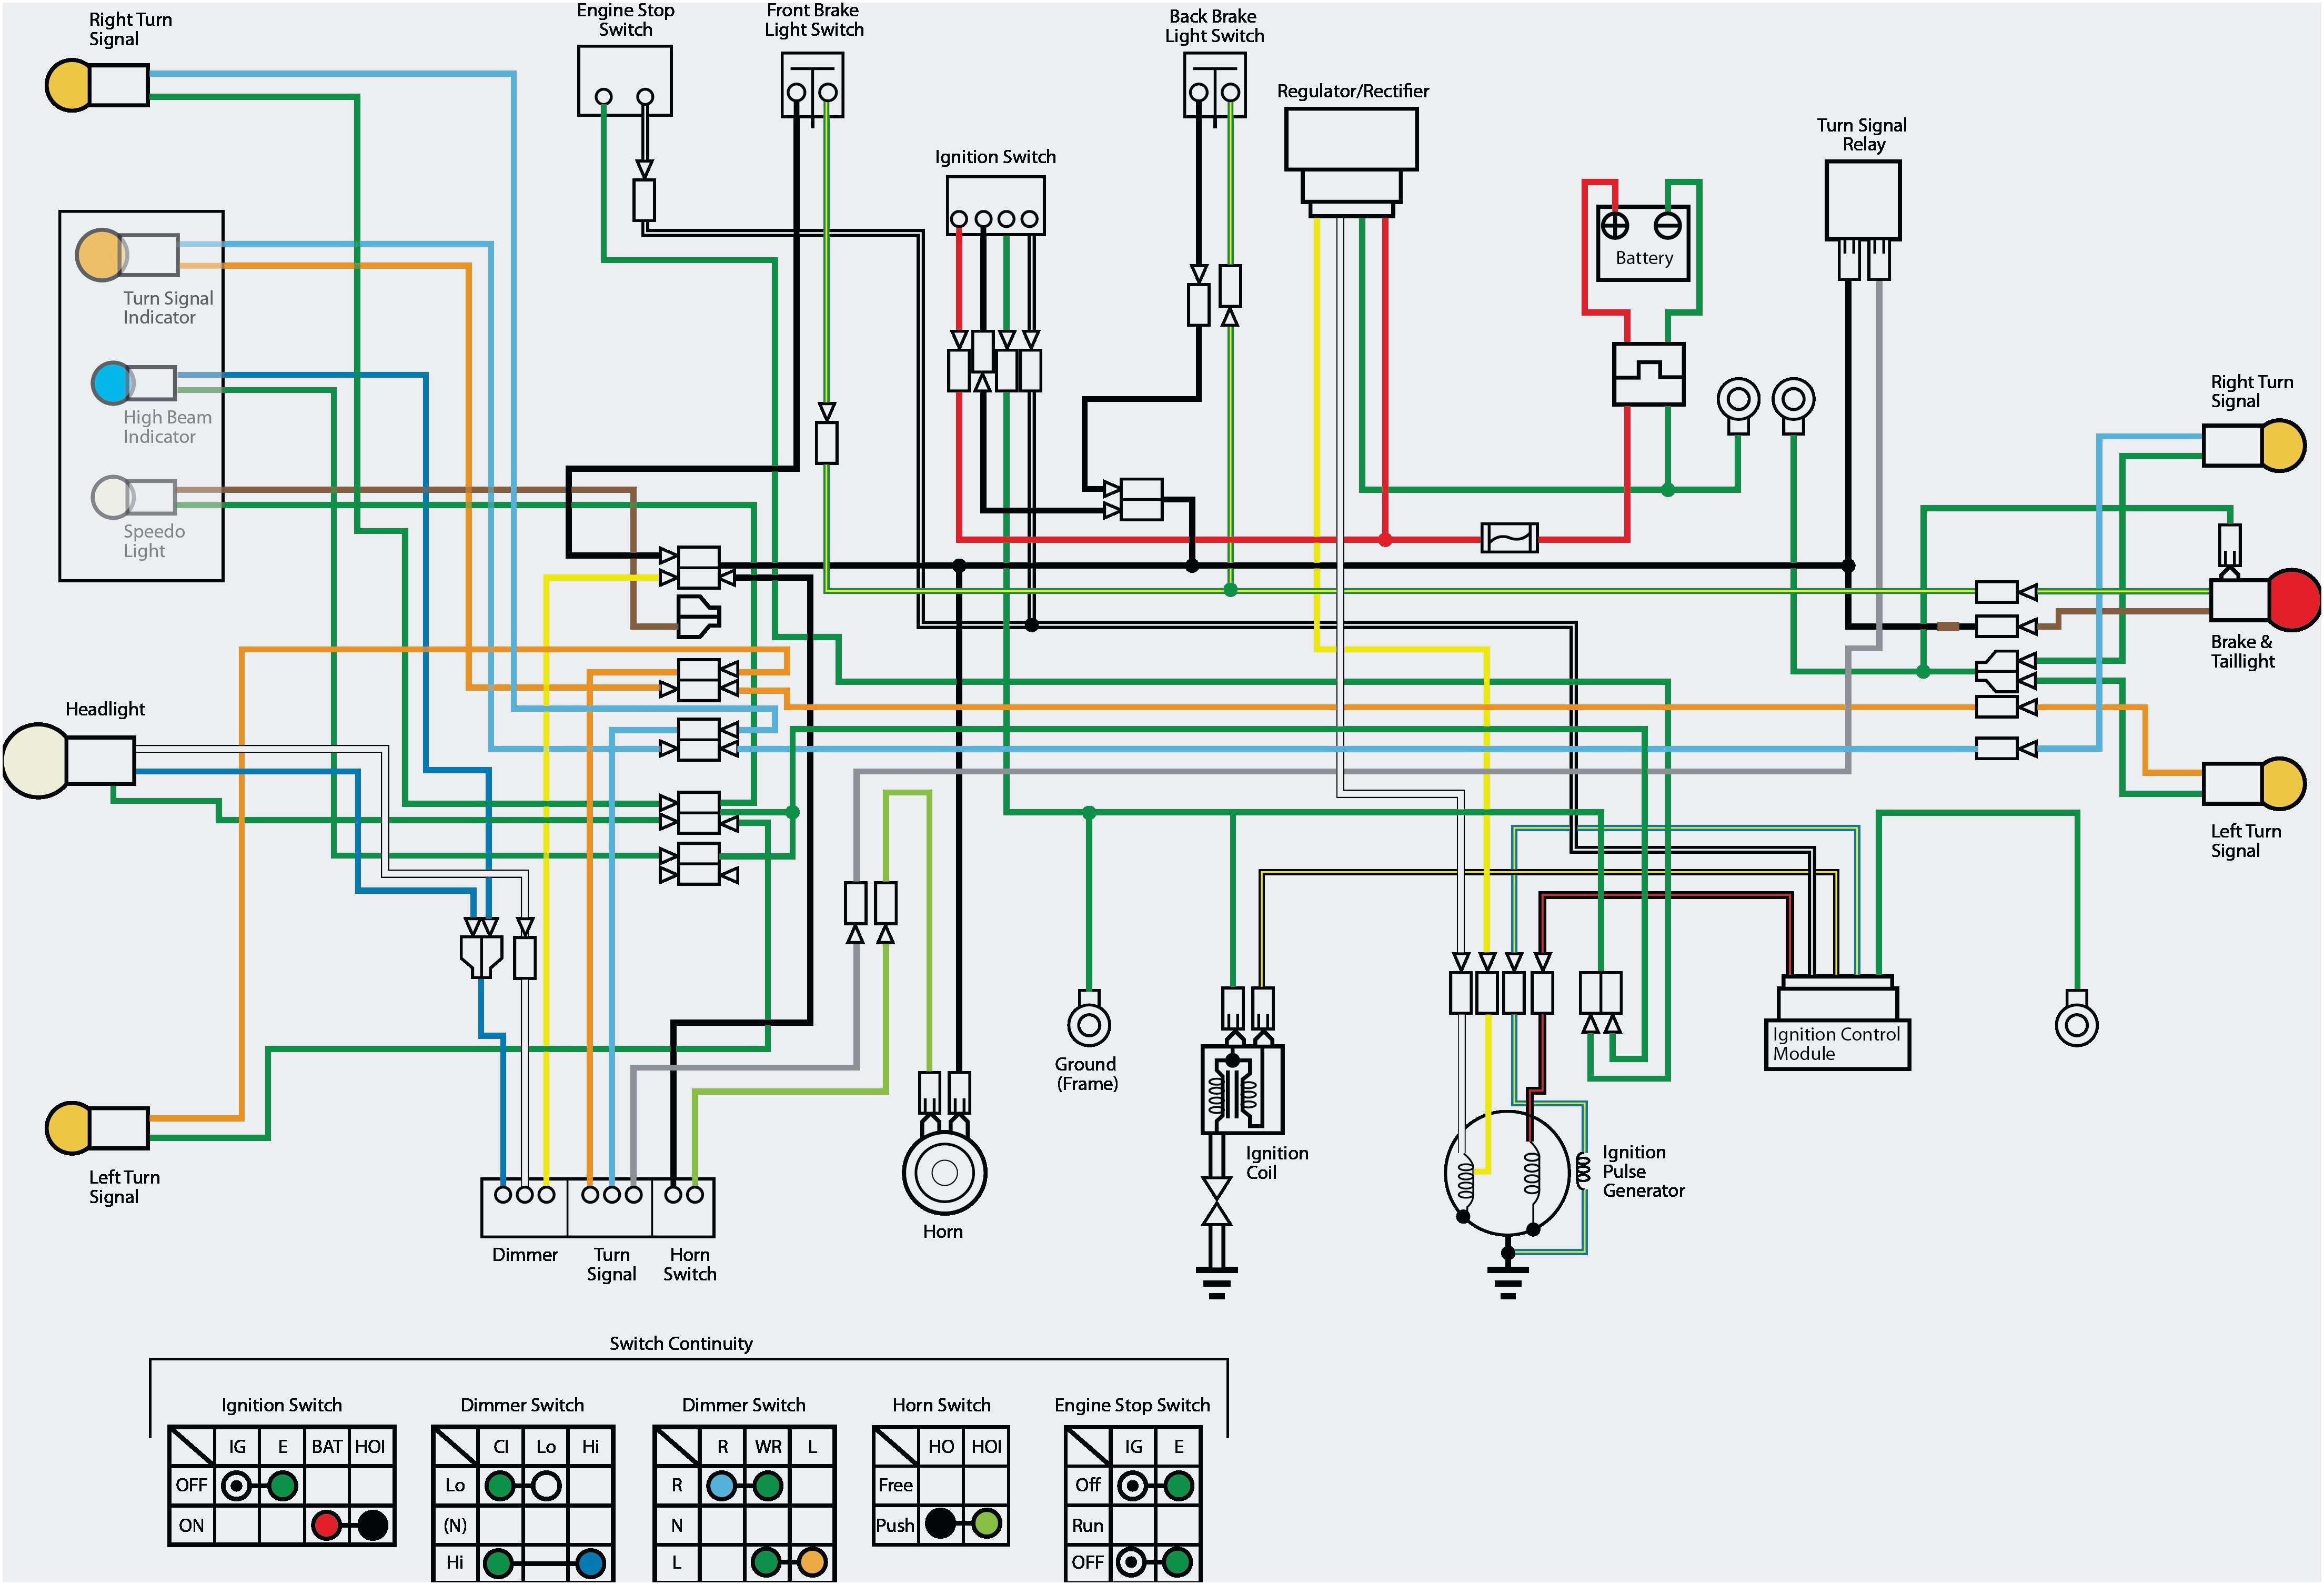 Frais Wiring Diagram Brake Light Switch Refrence Universal - Brake Light Switch Wiring Diagram